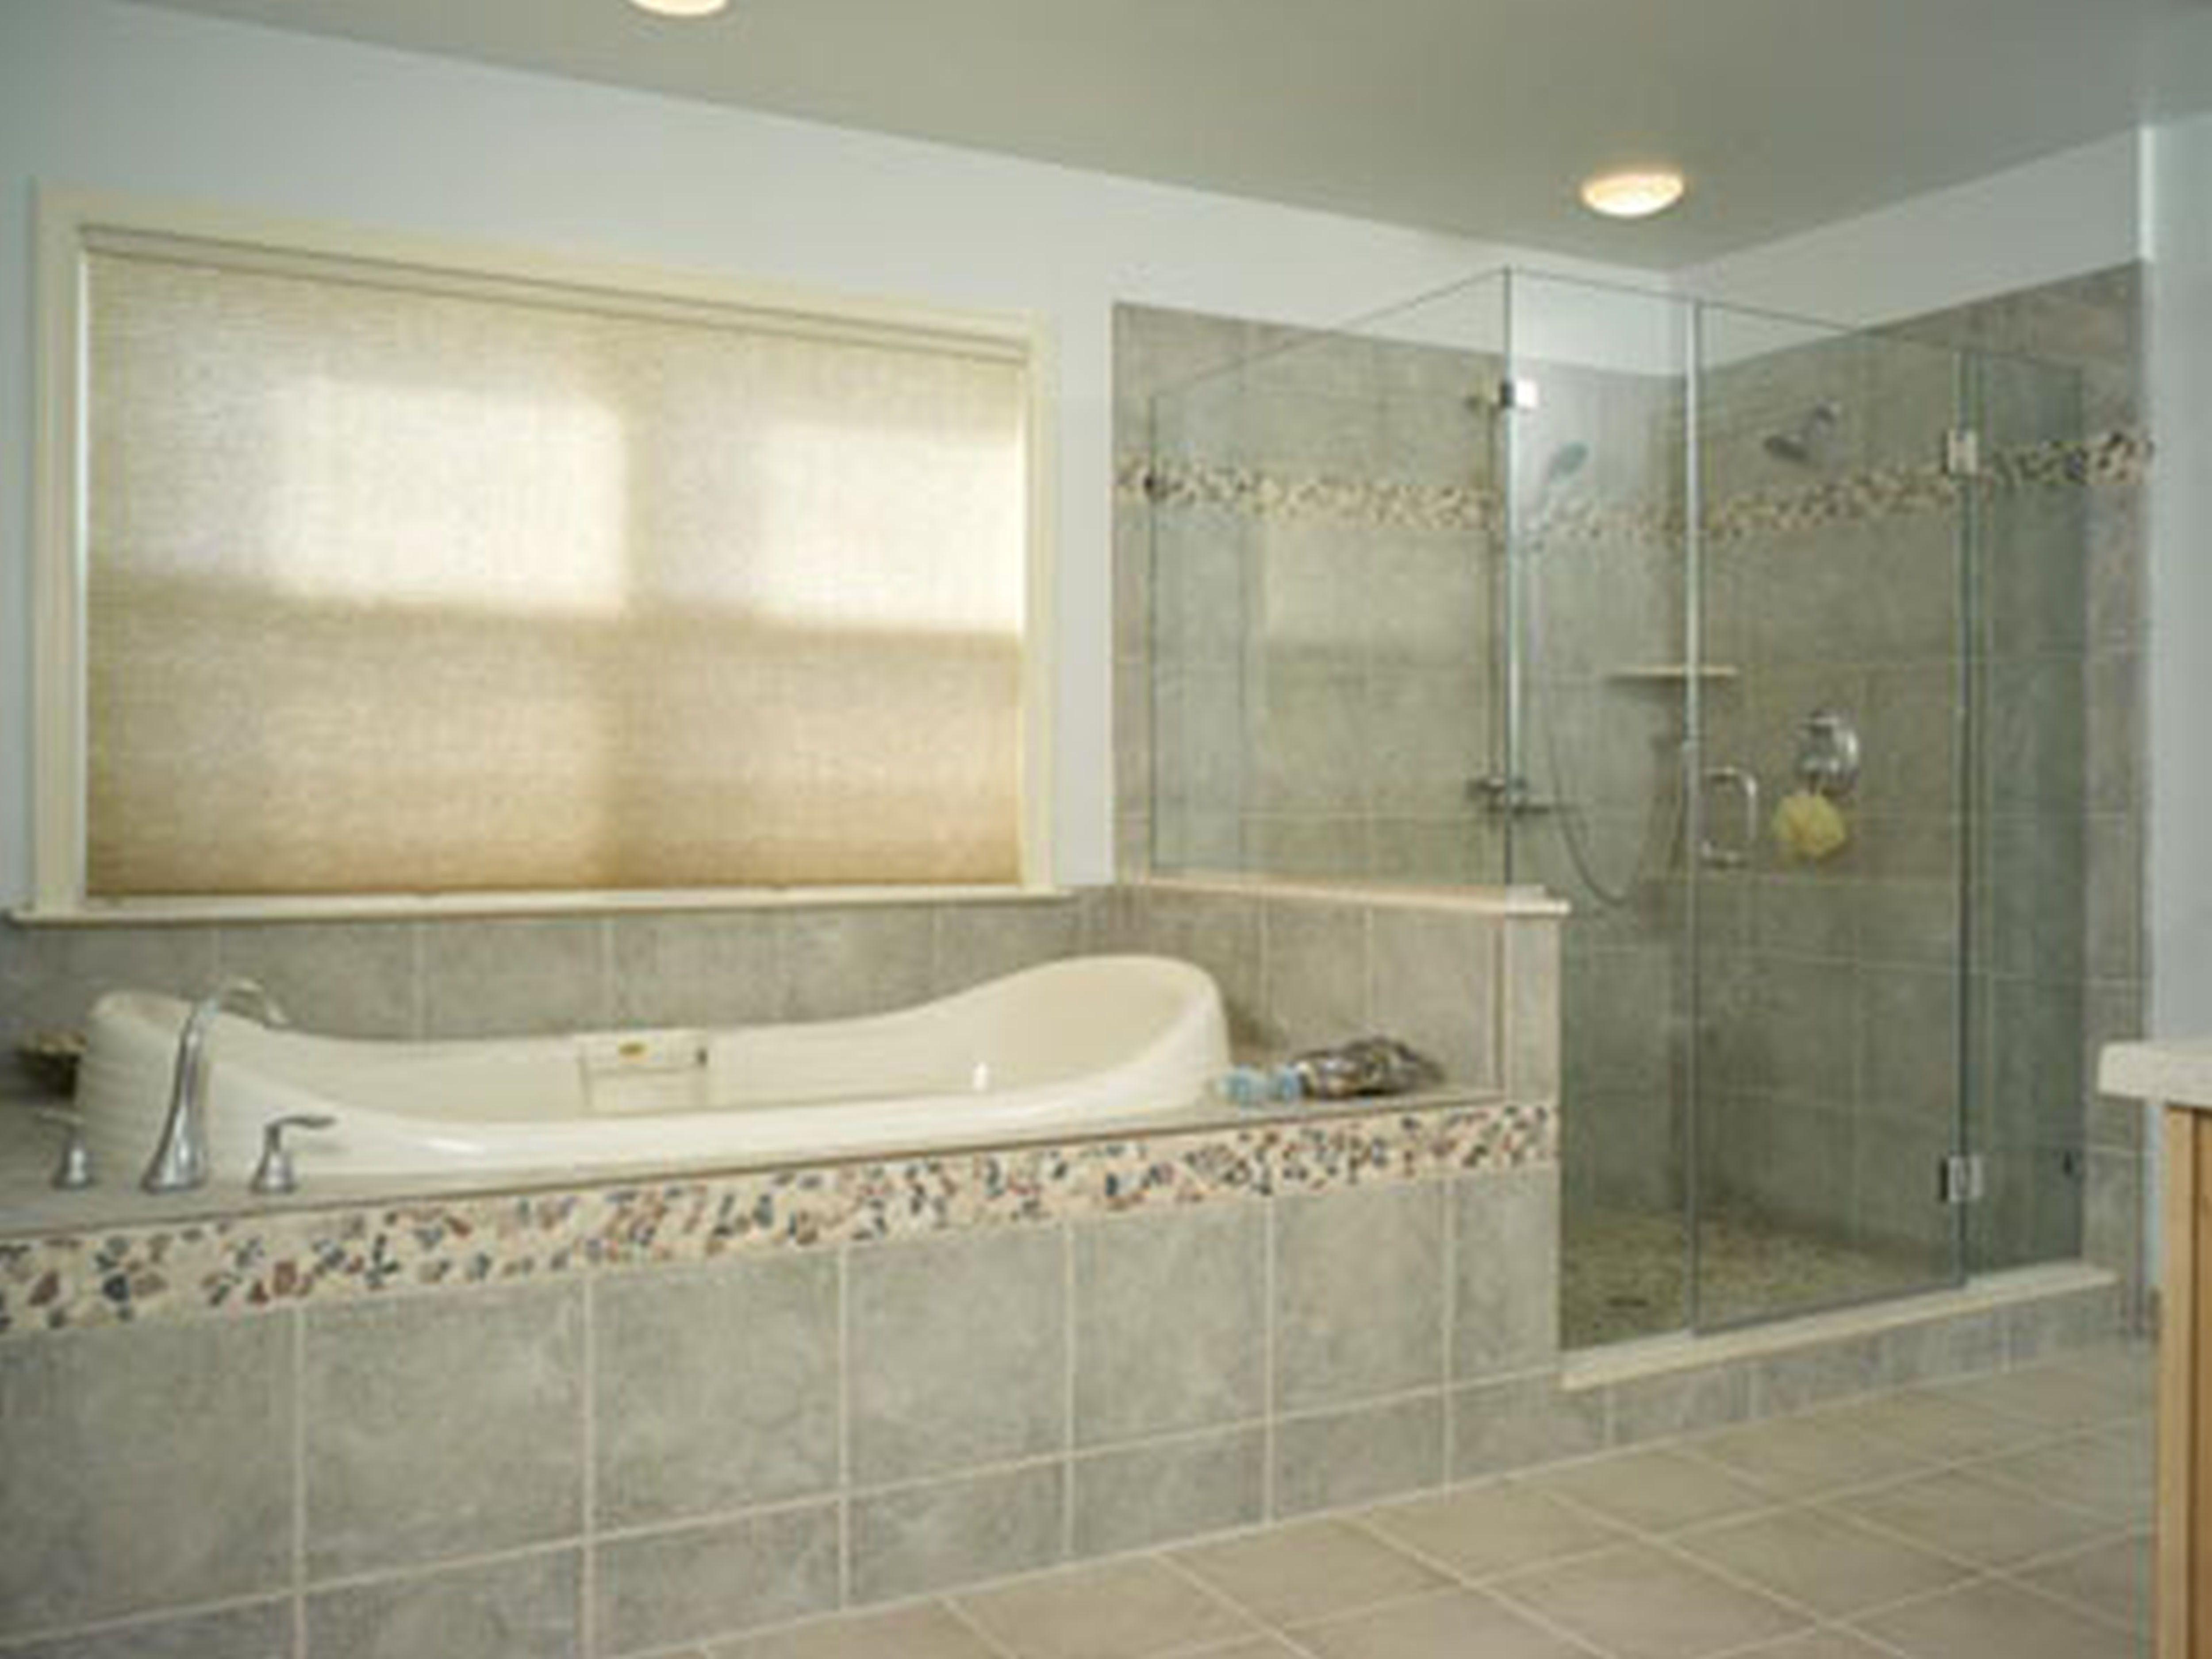 Bathroom Design Nice Master Bath Ideas for Beautiful Image